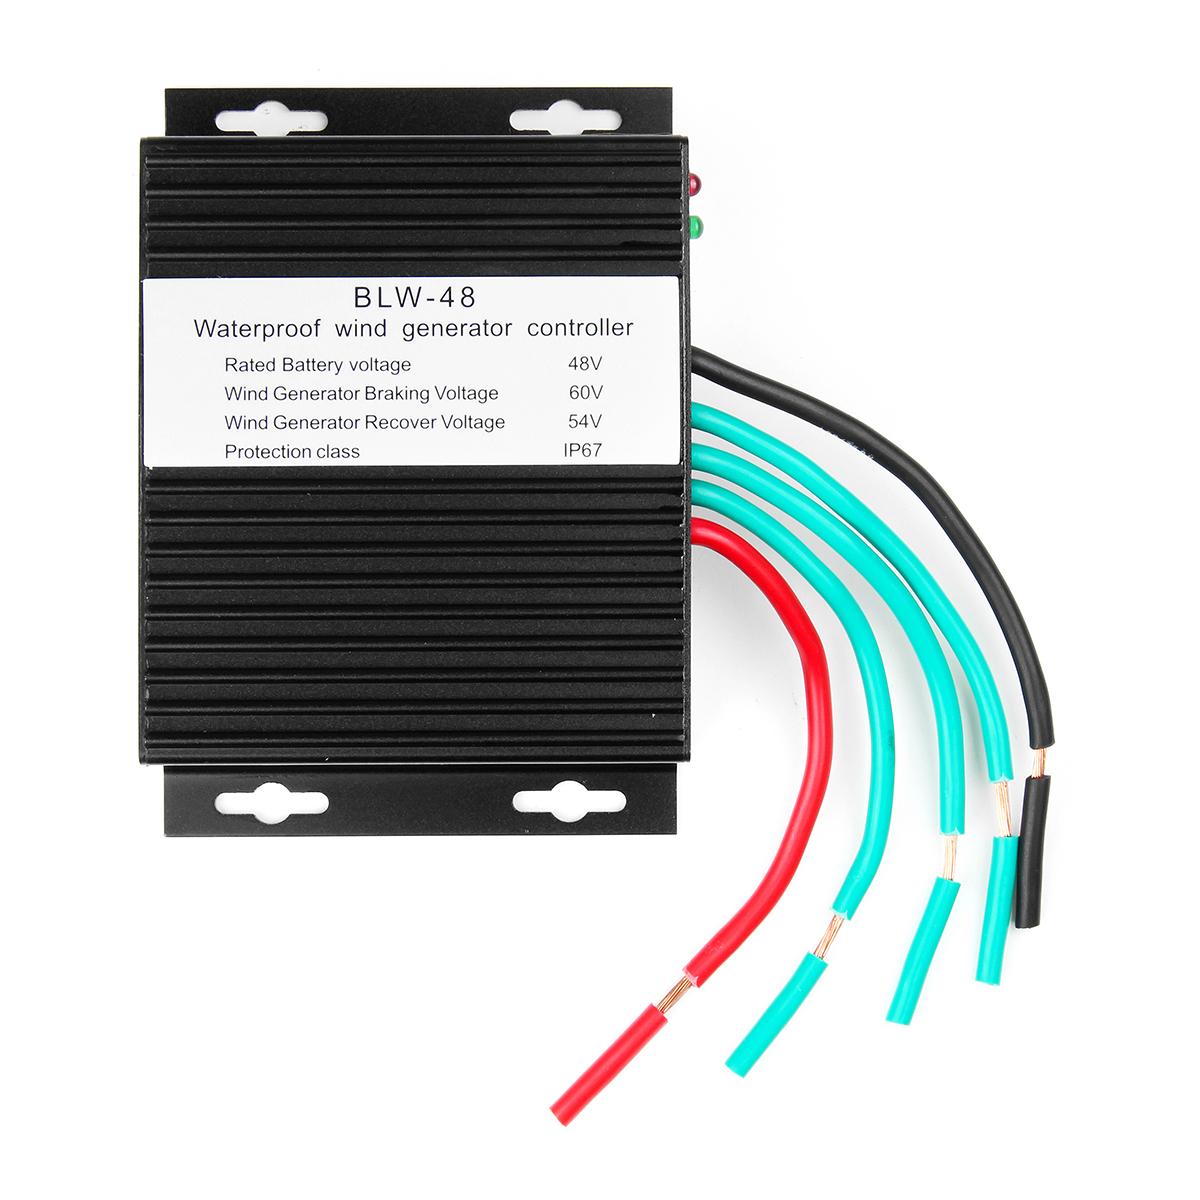 48V 500W Wind Charge Controller Wind Turbine Generator Controller Wind Generator Controller